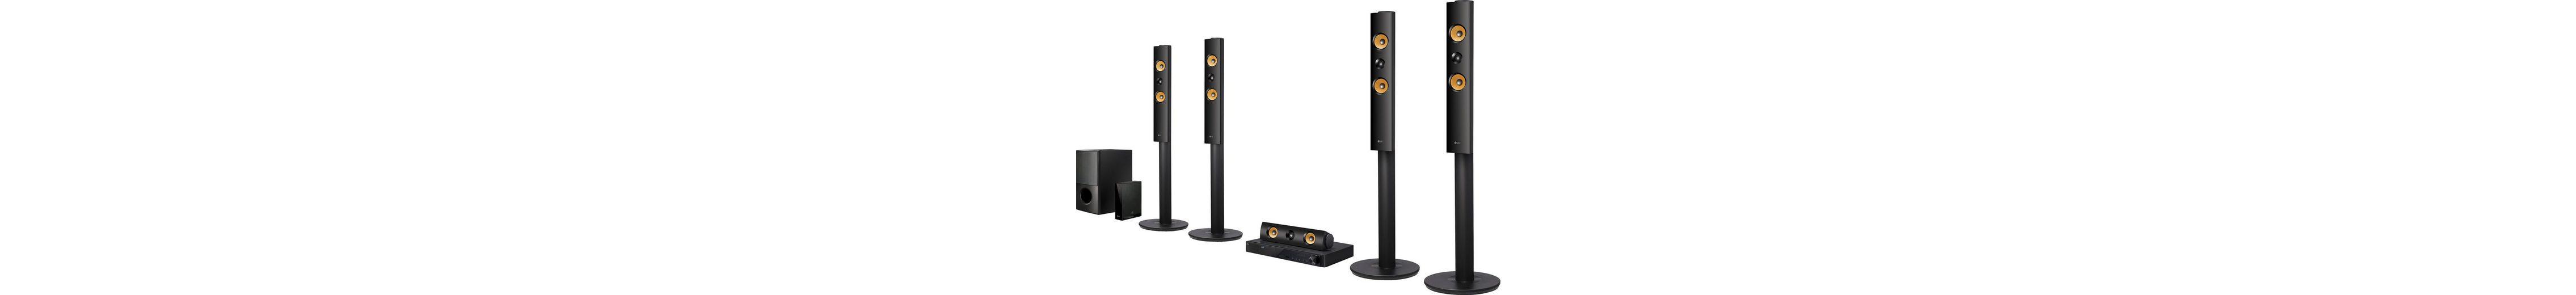 LG LHA855W 5.1 Heimkinosystem (3D Blu-ray Player, Hi-Res, 1.200 W, WLAN, Bluetooth, Spotify)